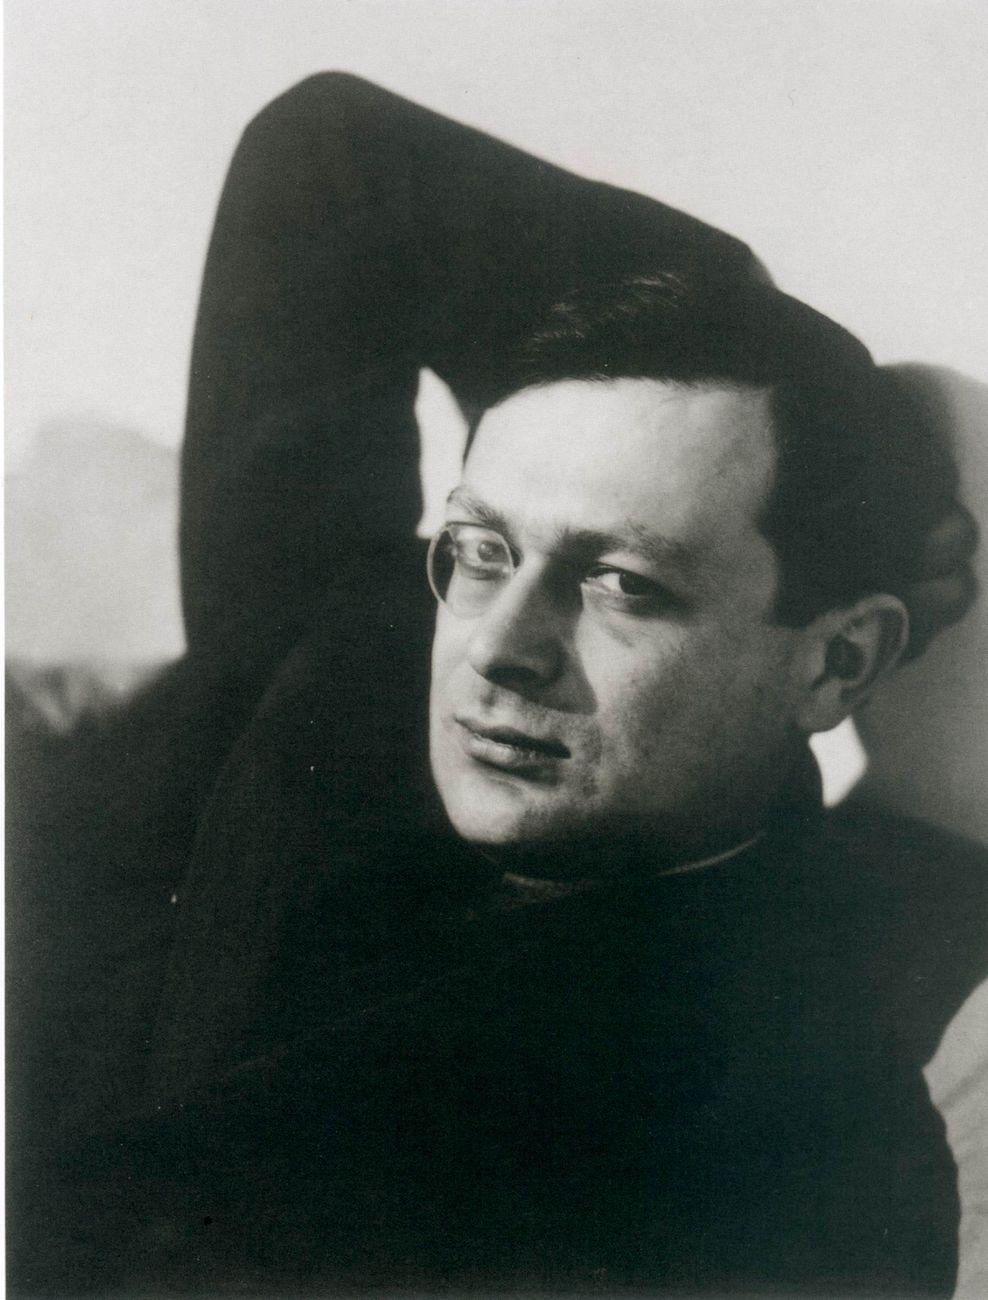 Man Ray, Tristan Tzara, 1934